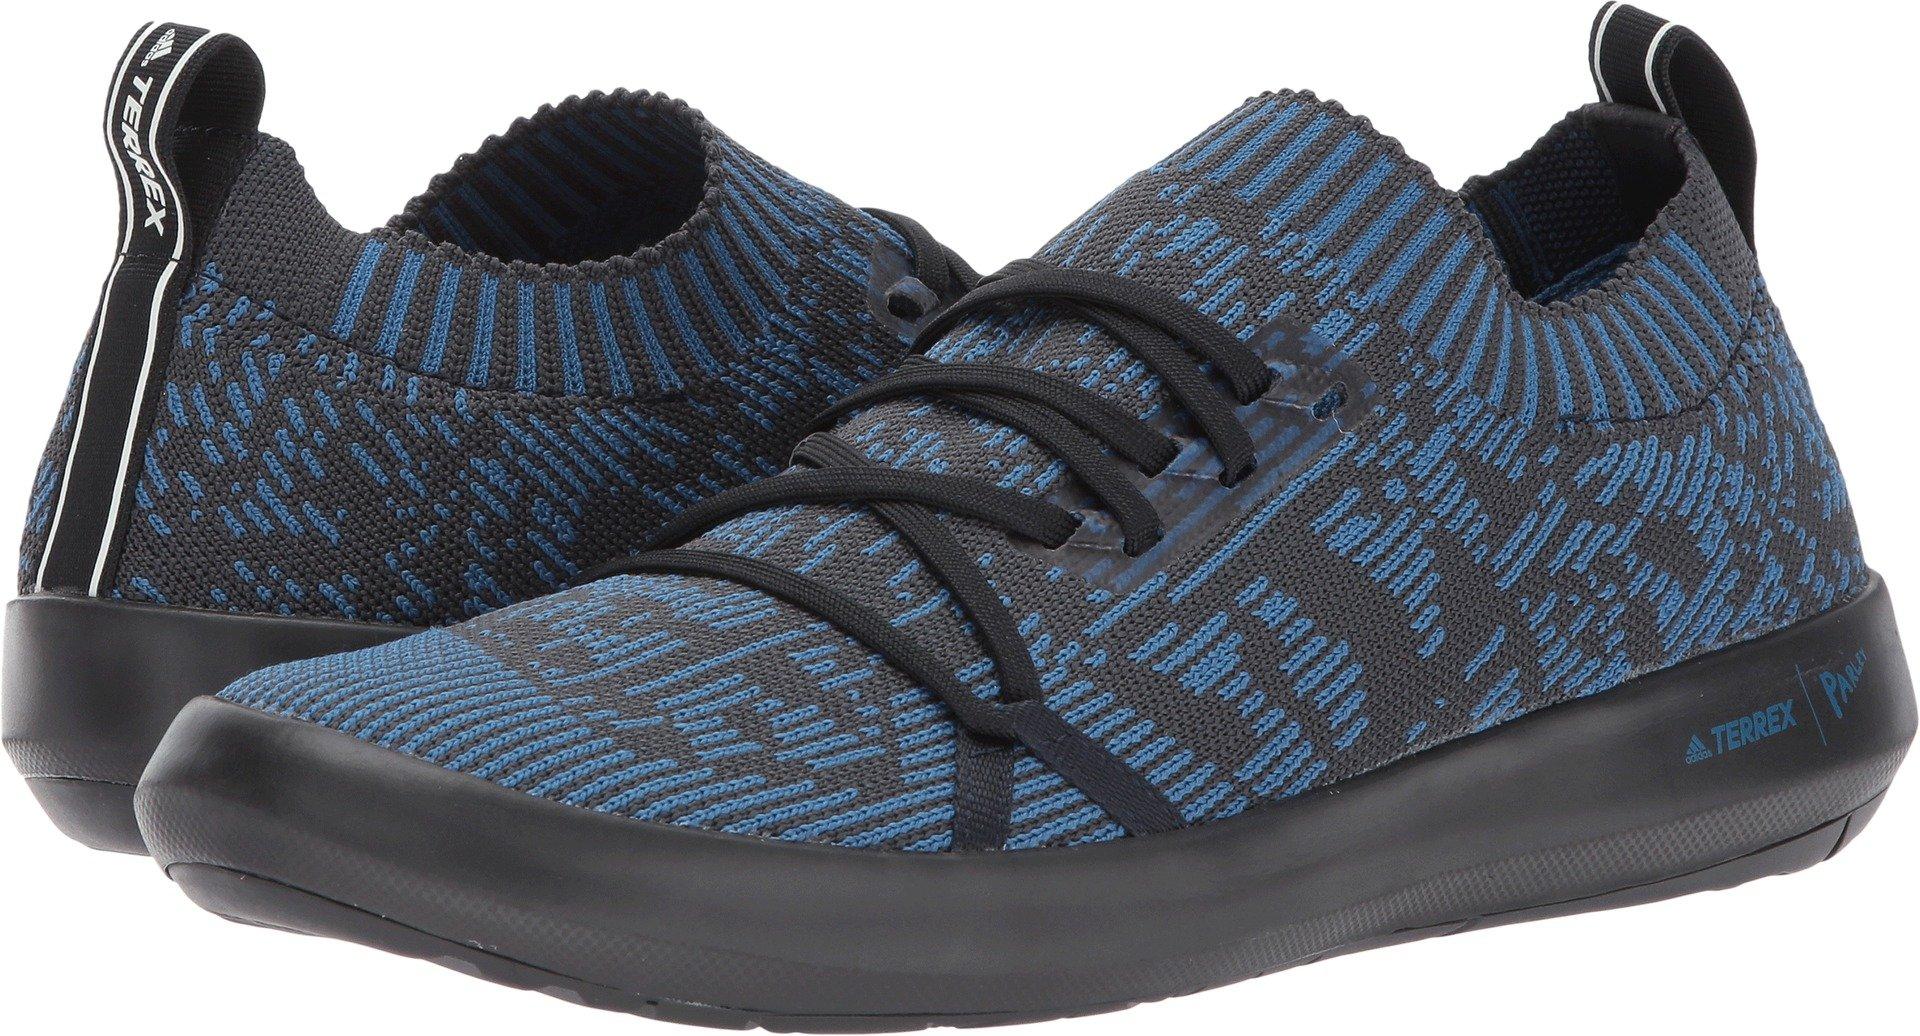 Adidas Sport Performance Men's Terrex Boat DLX Parley Sneakers, Blue, 14 M